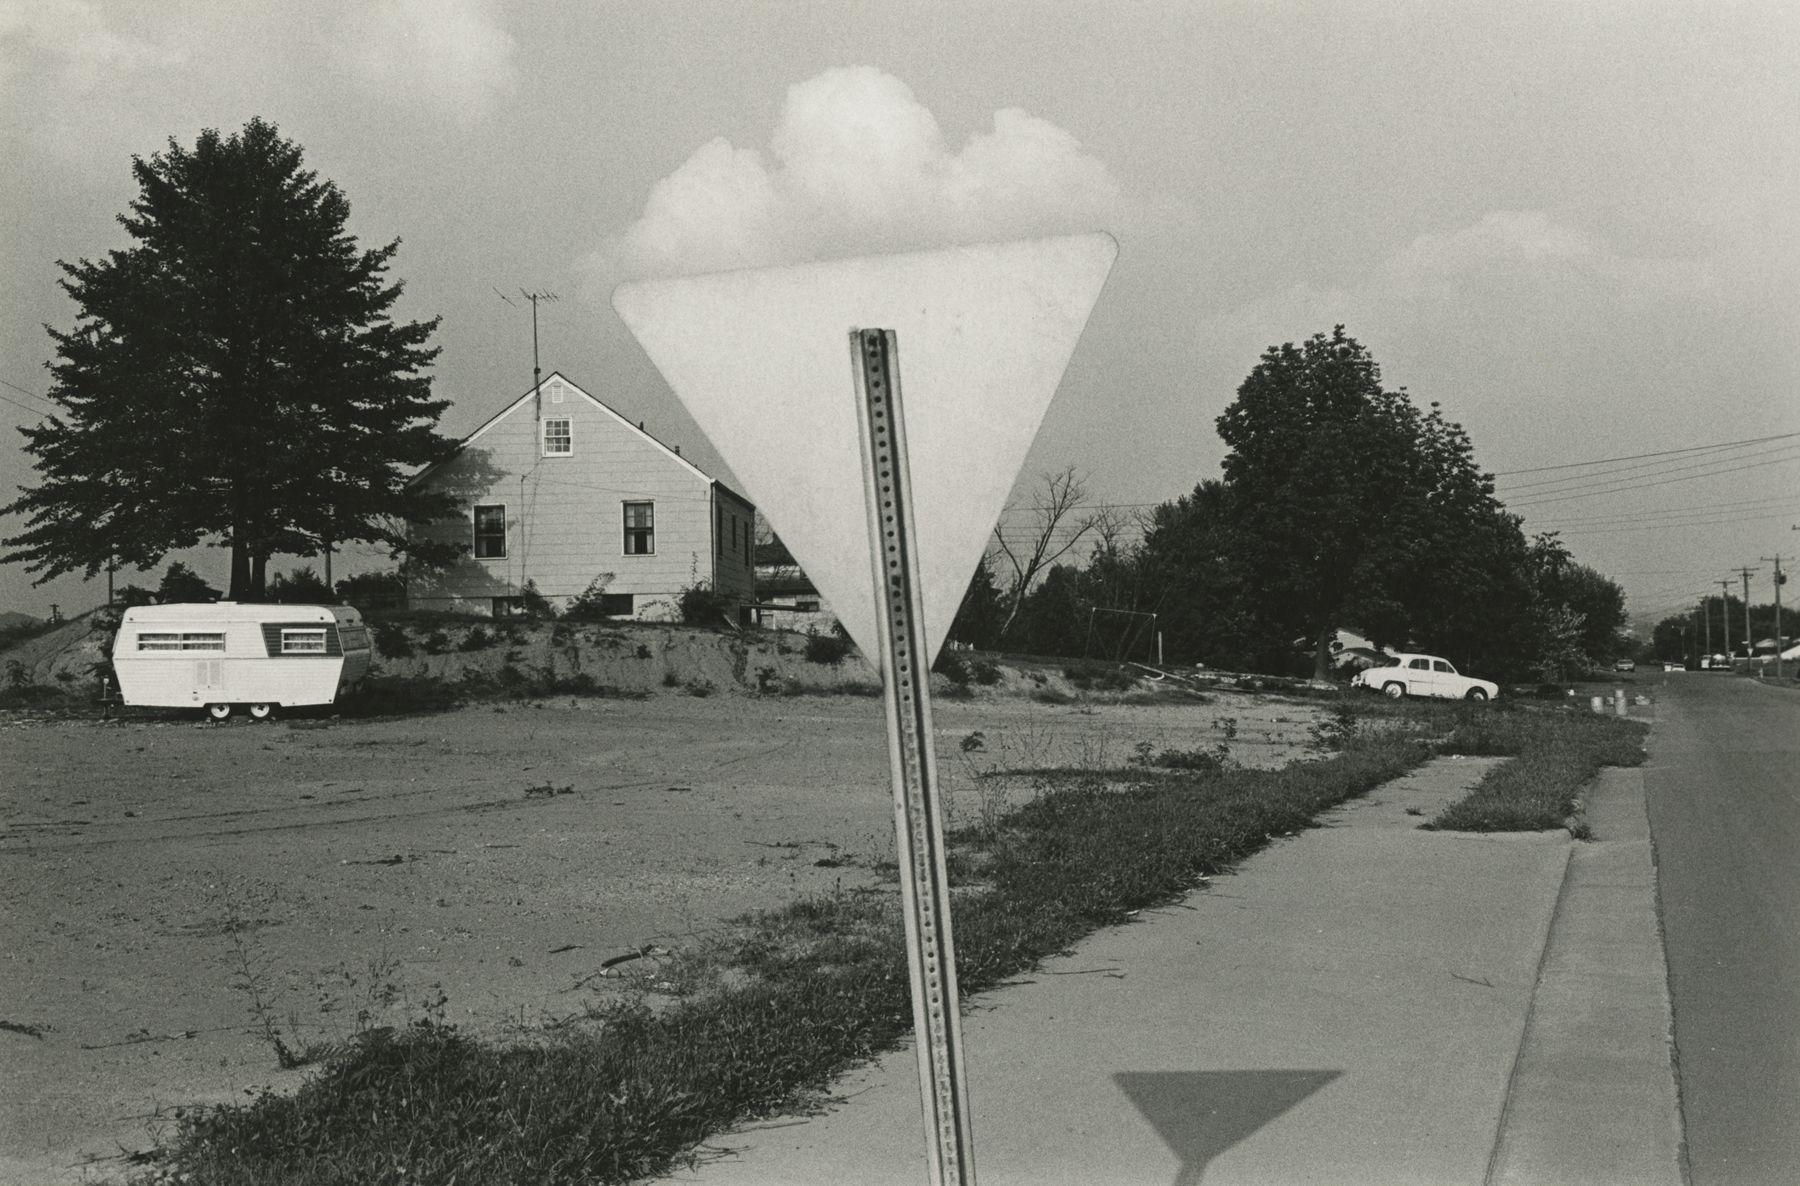 Lee Friedlander - Knoxville, 1971 - Howard Greenberg Gallery - 2018